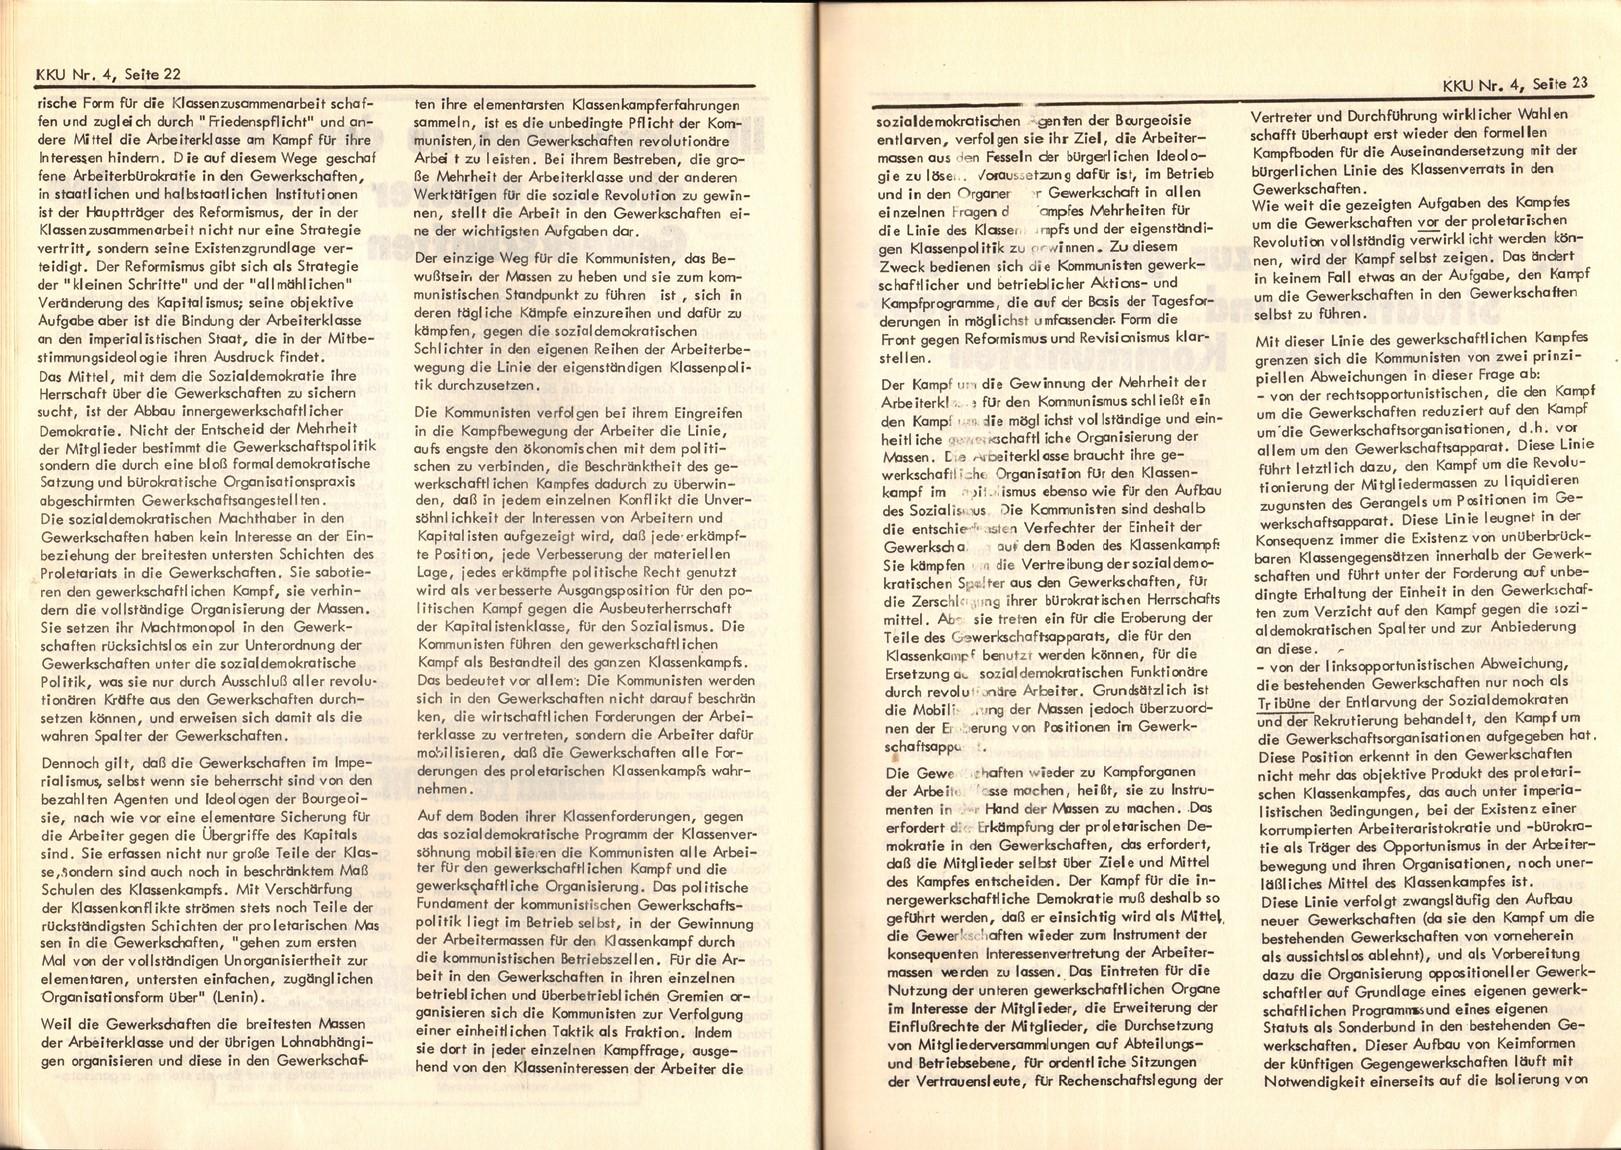 Frankfurt_Offenbach_KG_Kampf_Kritik_Umgestaltung_1973_04_05_12